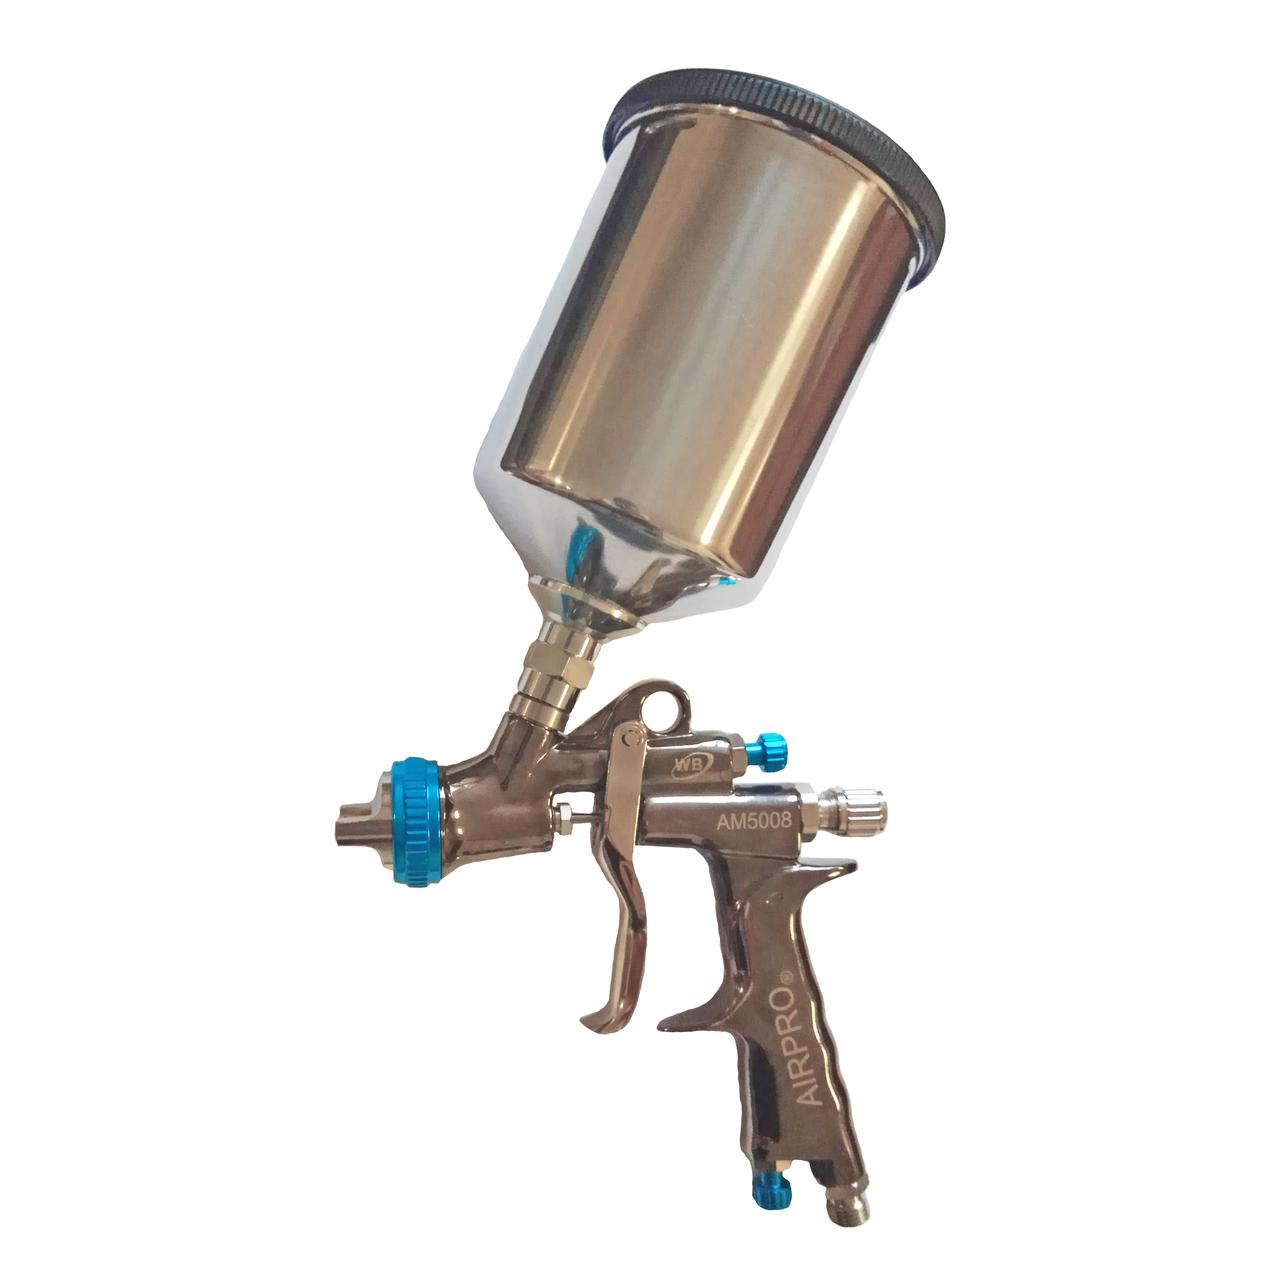 Краскопульт пневматический Air Pro AM5008 LVLP WB PLUS-AL (1,2 мм)